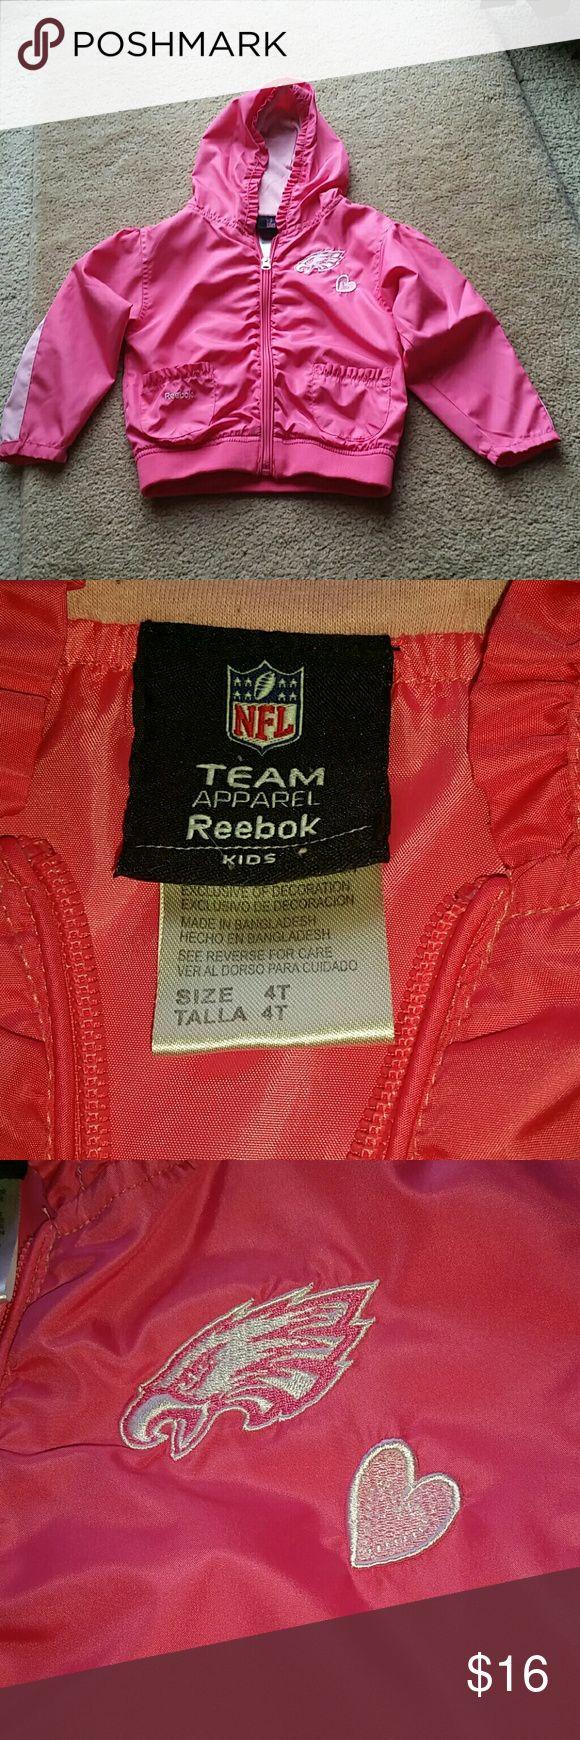 Reebok size 4T Eagles jacket Reebok size 4T Philadelphia Eagles jacket. Cute lightweight jacket!! Reebok Jackets & Coats